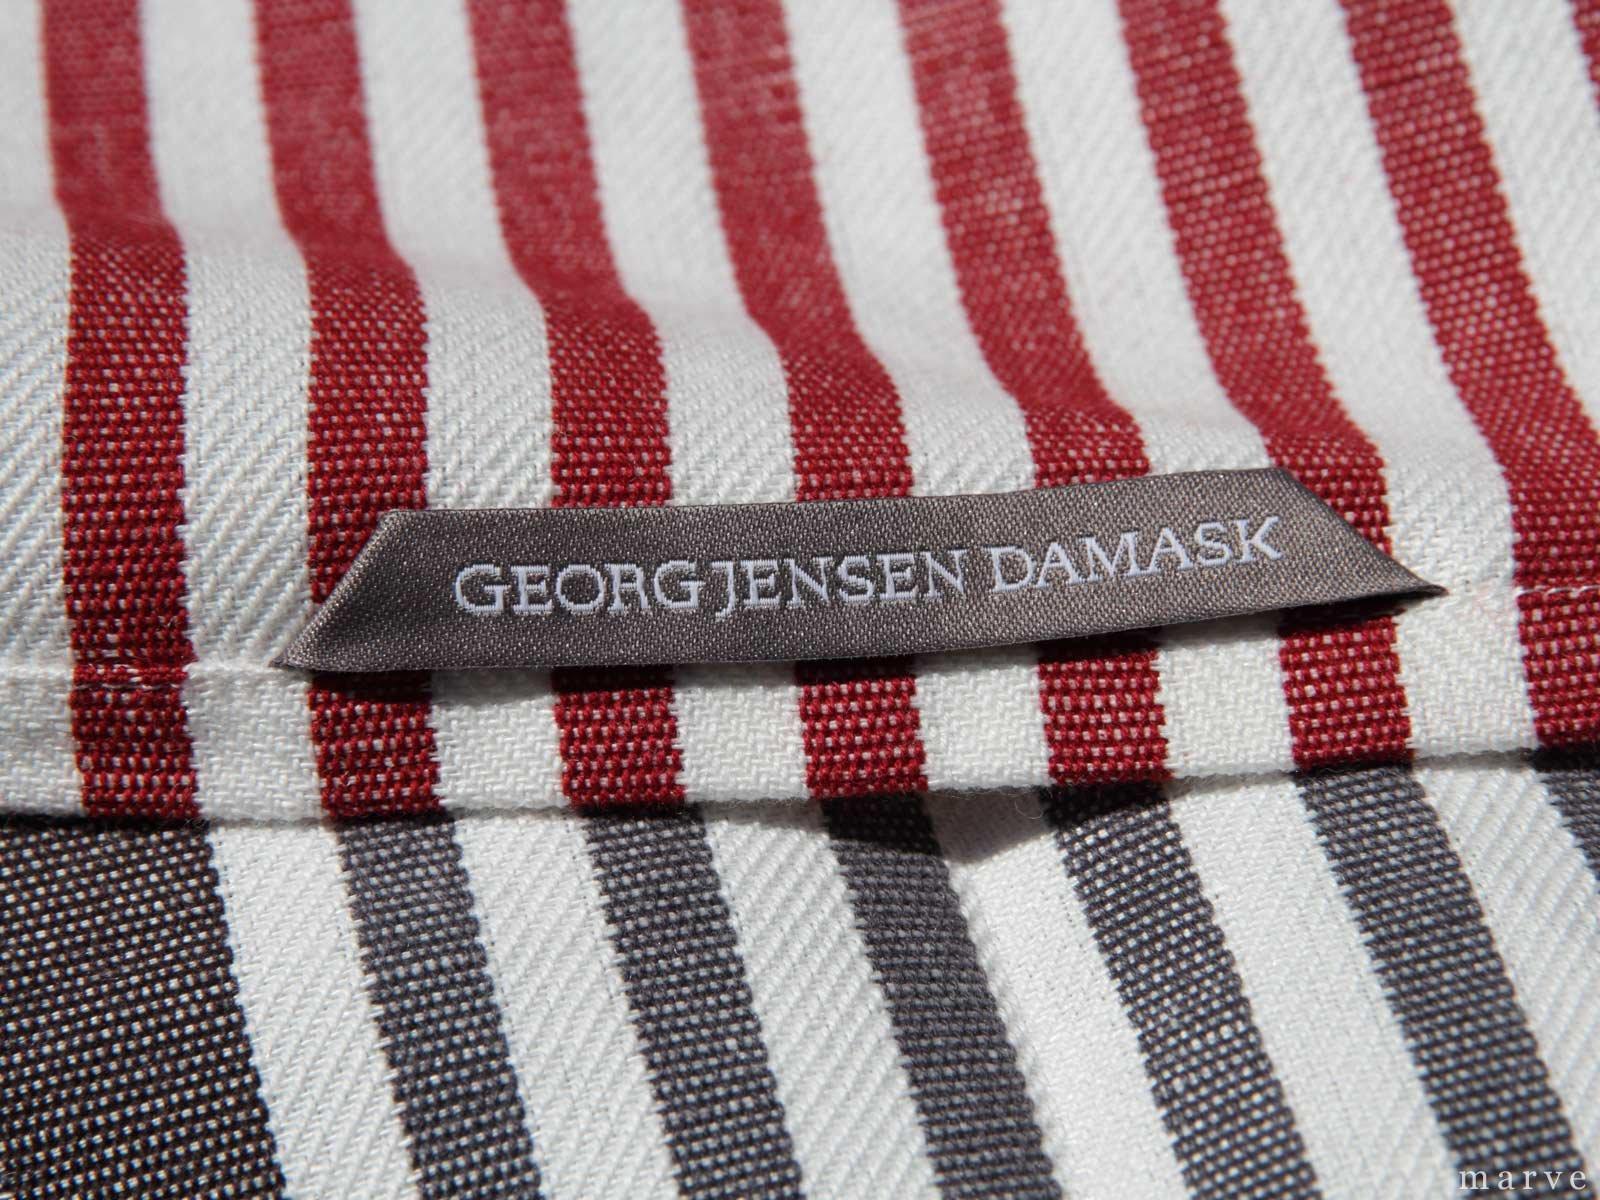 Georg Jensen Damask キッチンタオル ABILD<img class='new_mark_img2' src='https://img.shop-pro.jp/img/new/icons16.gif' style='border:none;display:inline;margin:0px;padding:0px;width:auto;' />